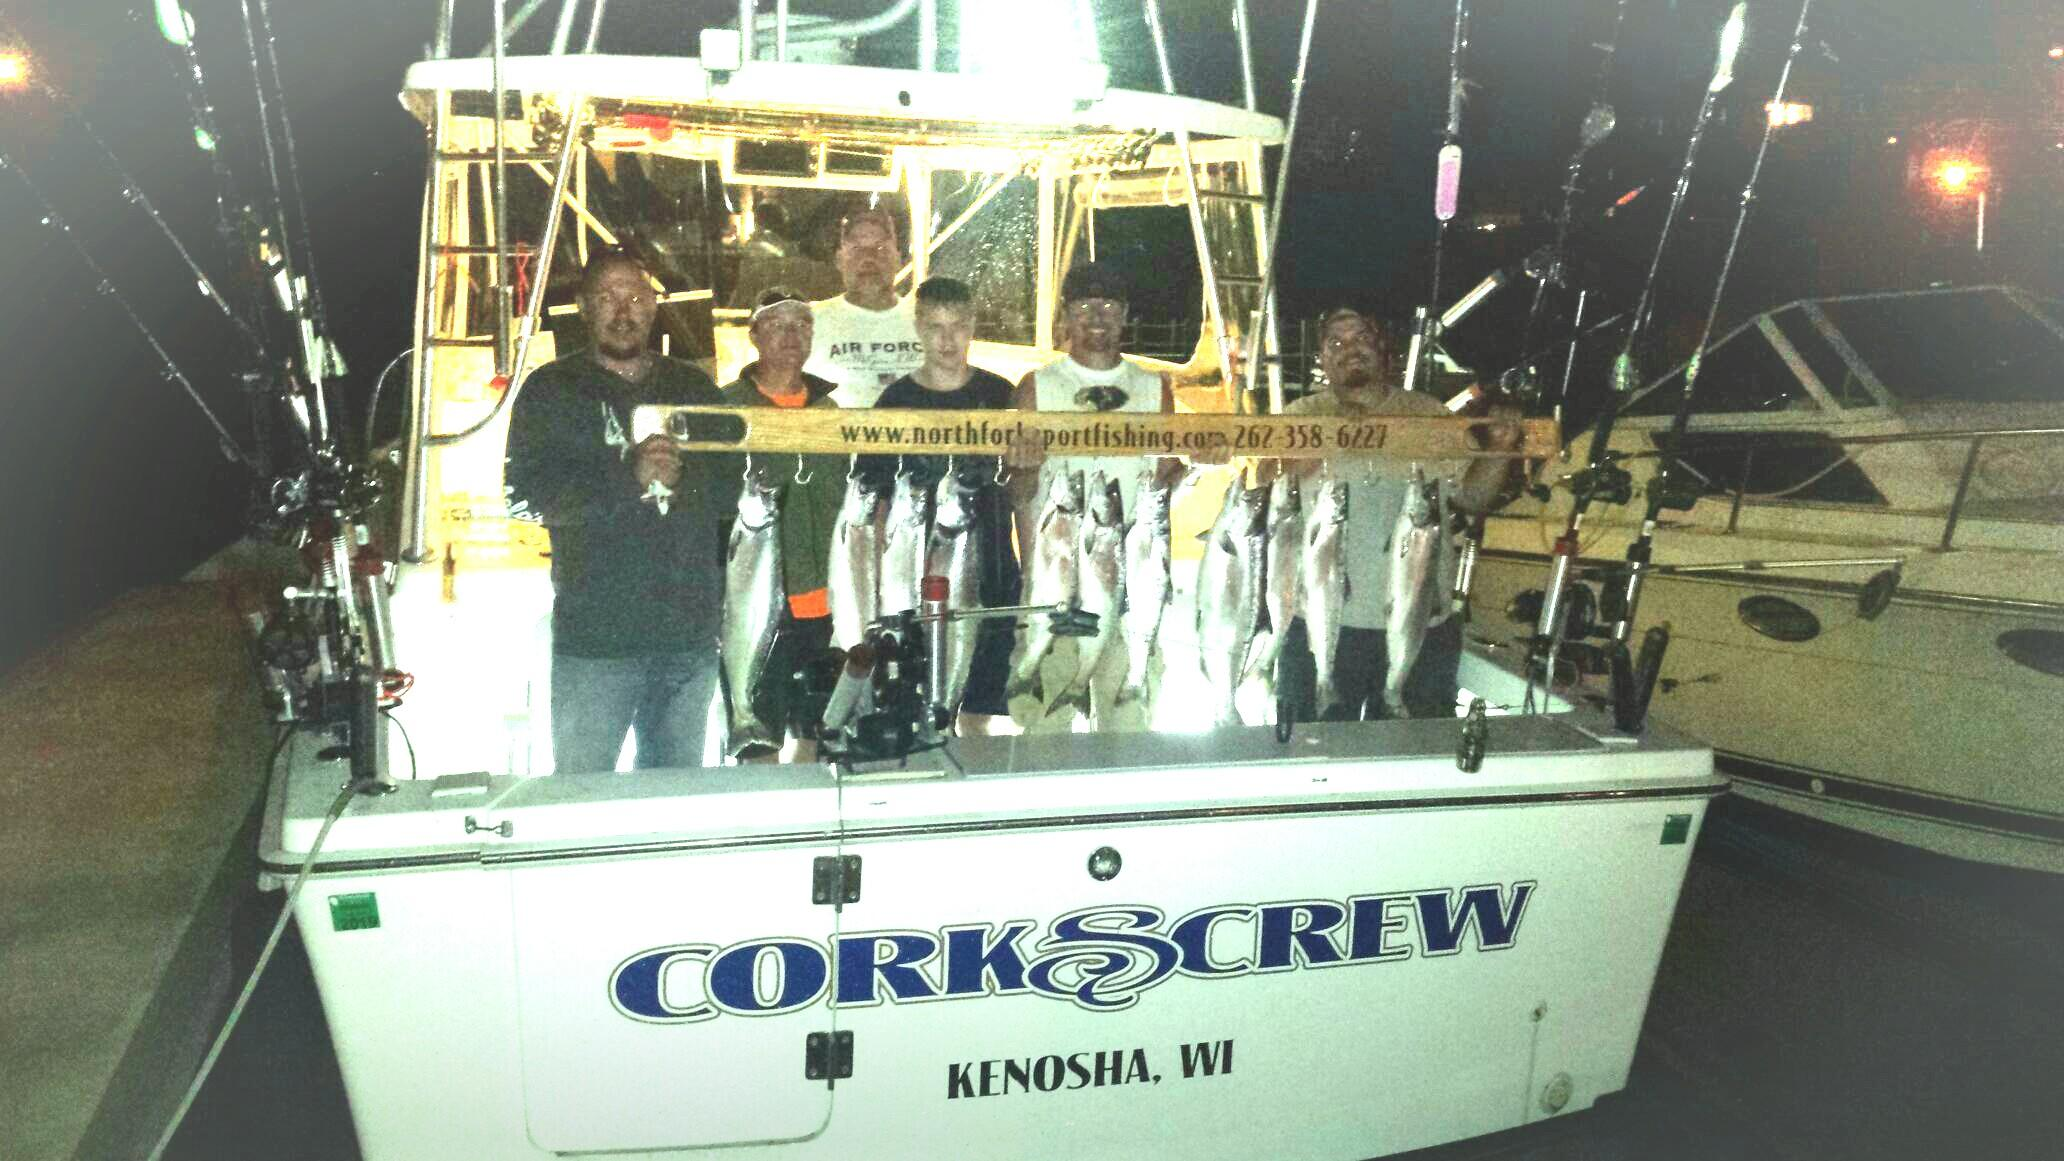 evening-sport-fishing-trip-group